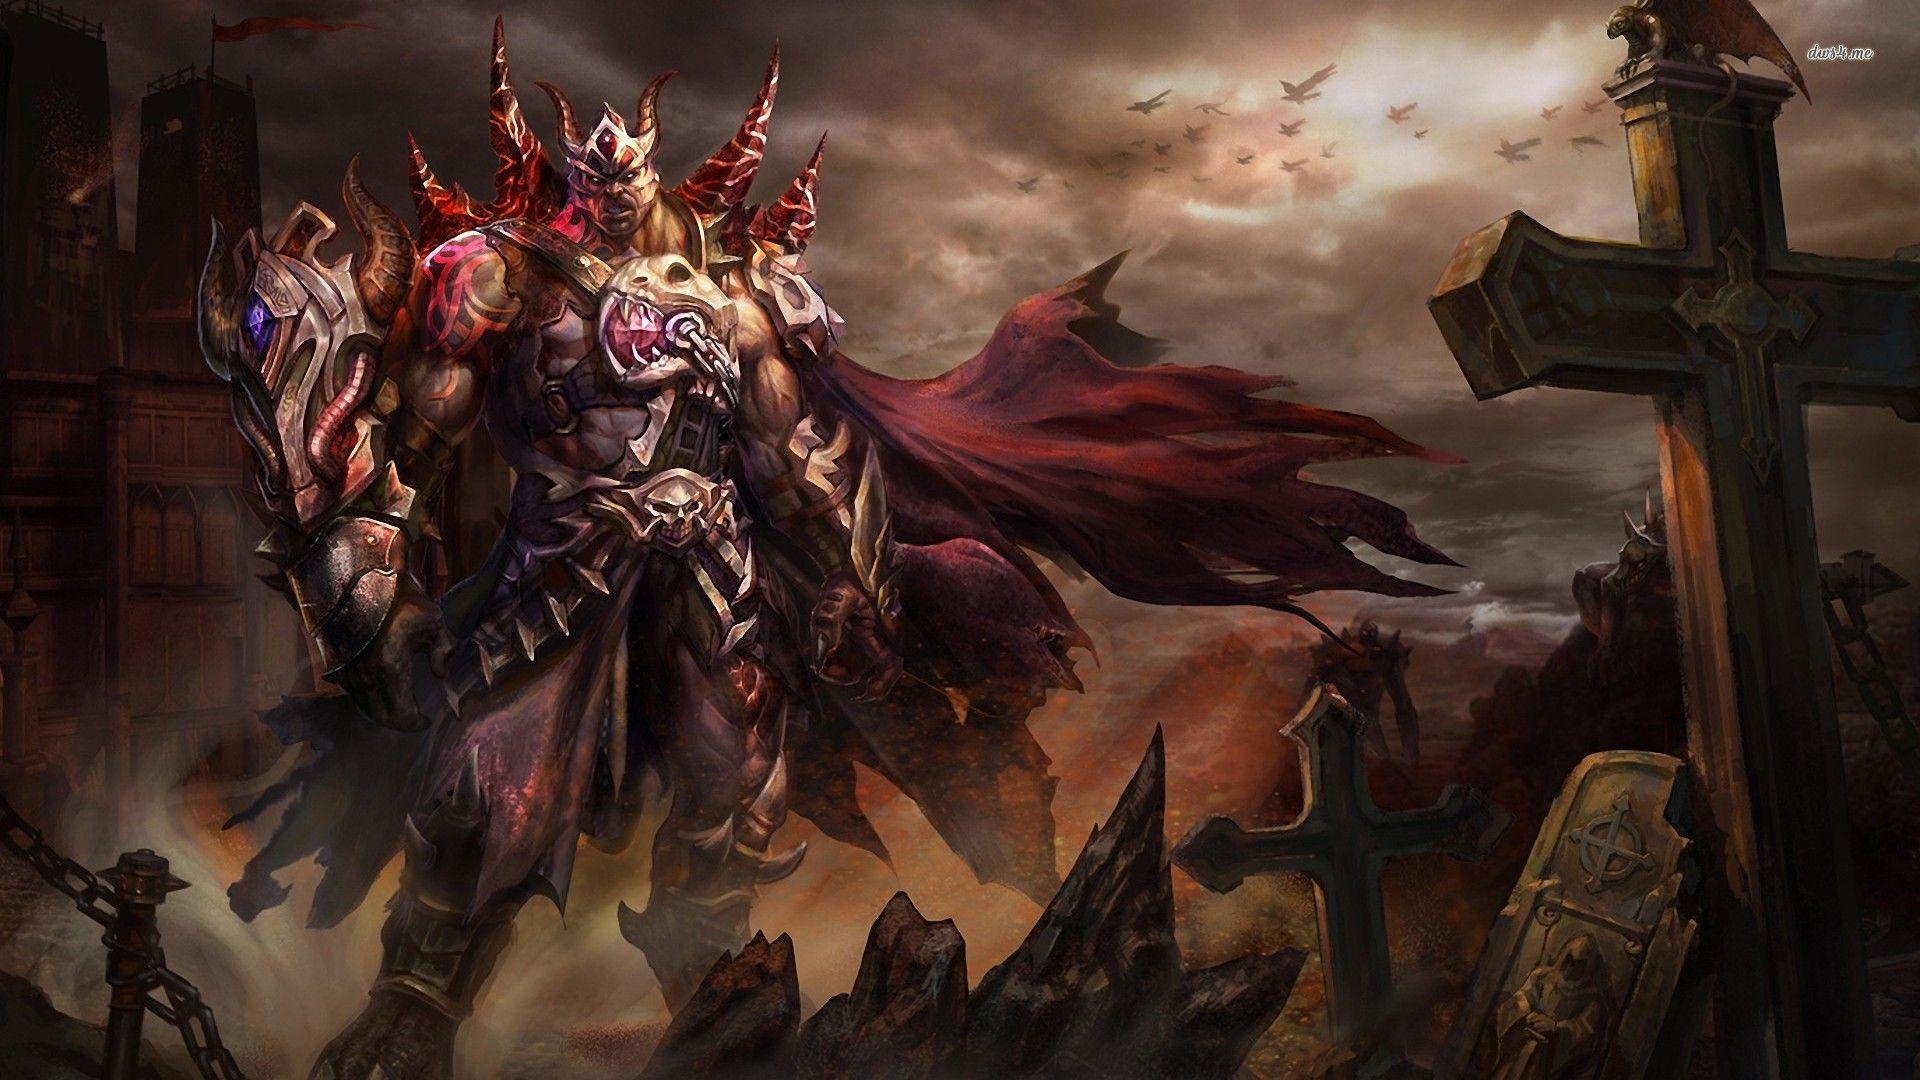 Demon Warrior Hd Wallpaper Gargoyles Art Warriors Wallpaper Demon